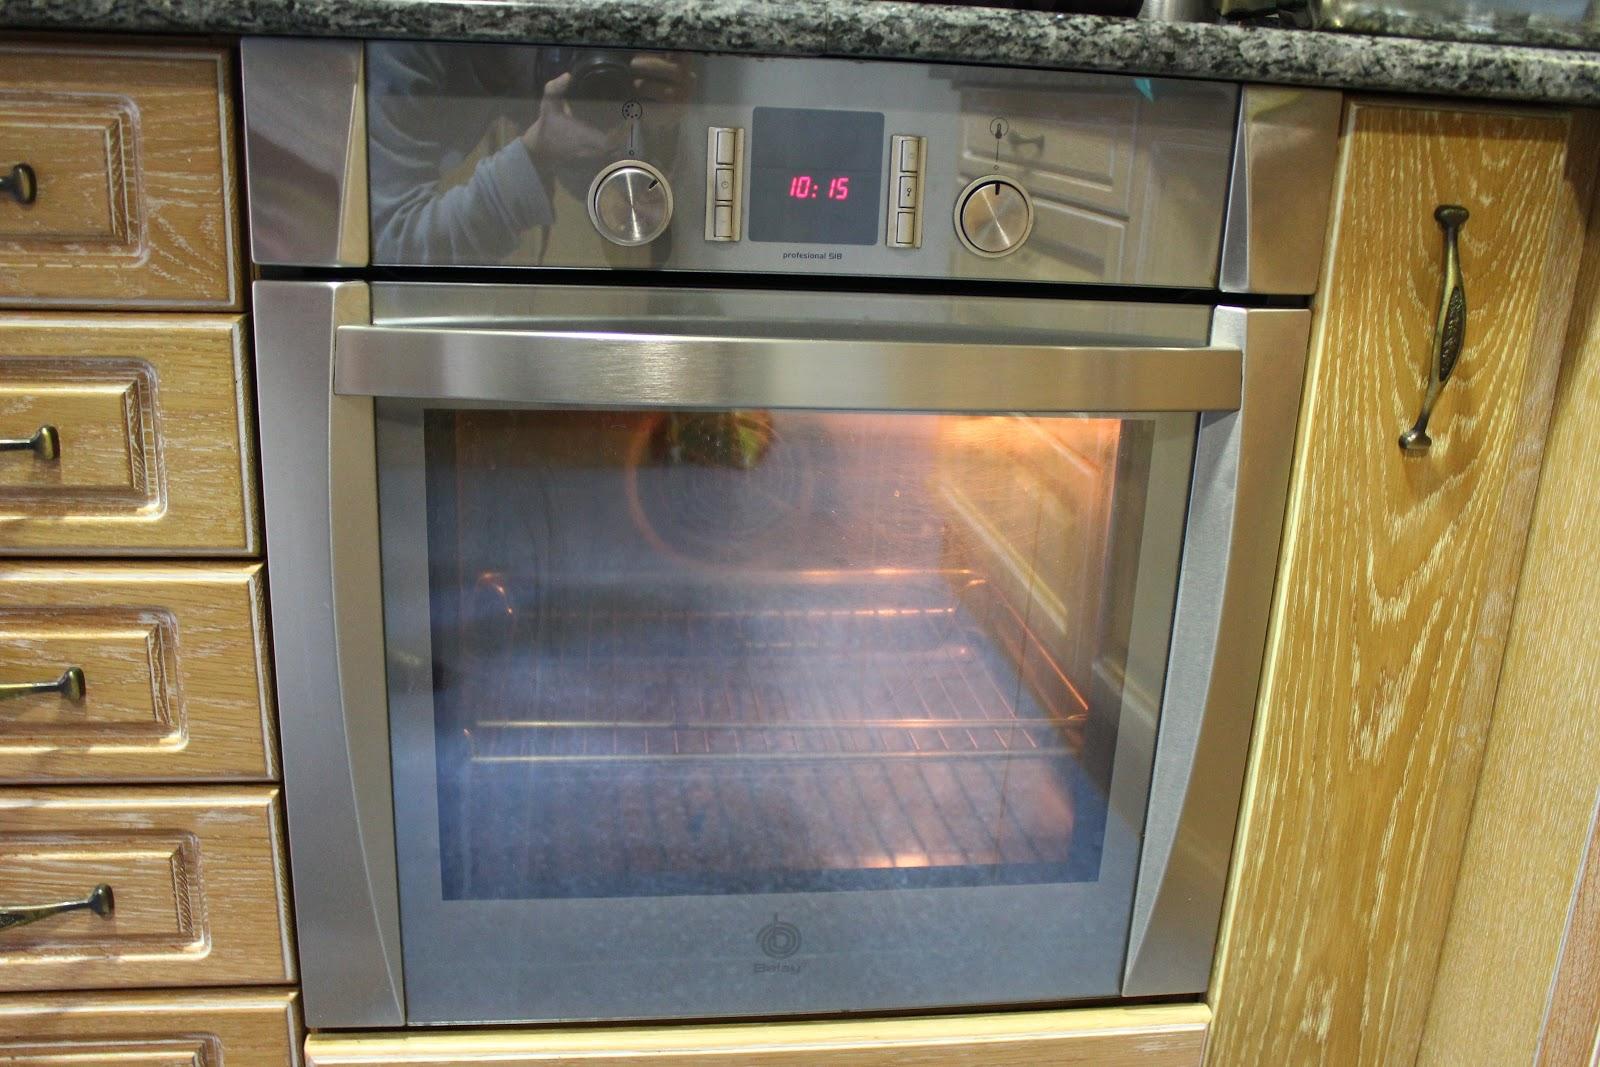 Miketouille herramientas de cocina reposter a for Herramientas de cocina